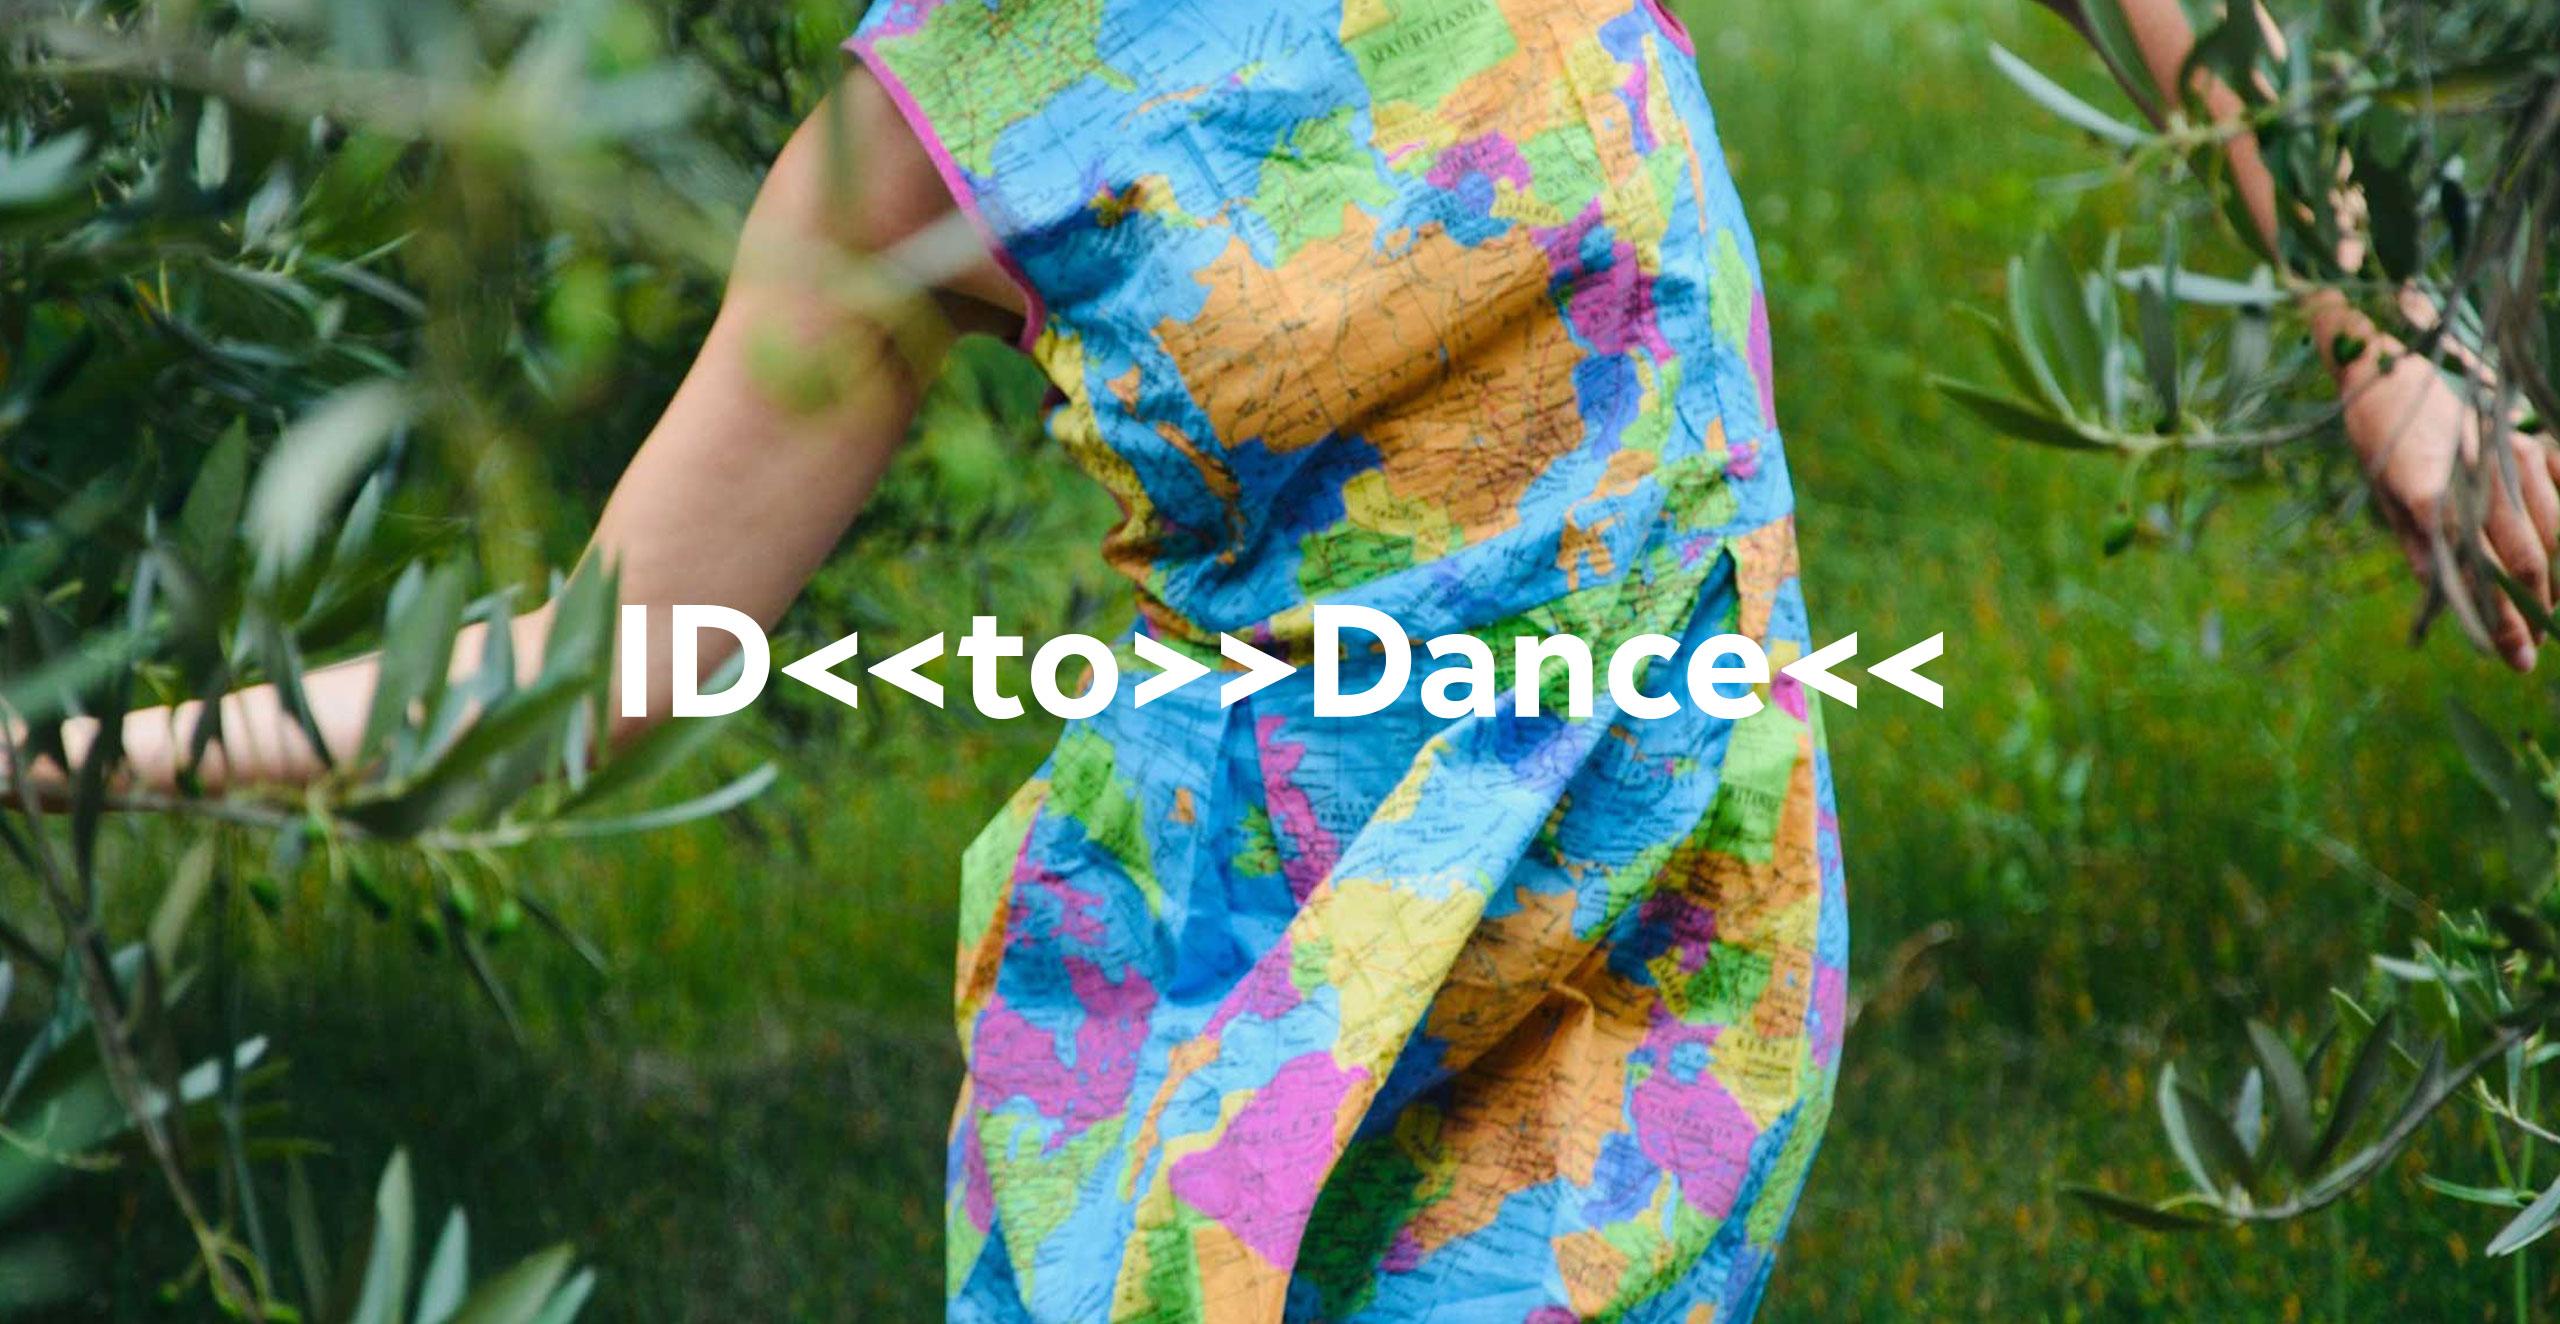 IDtoDance-head